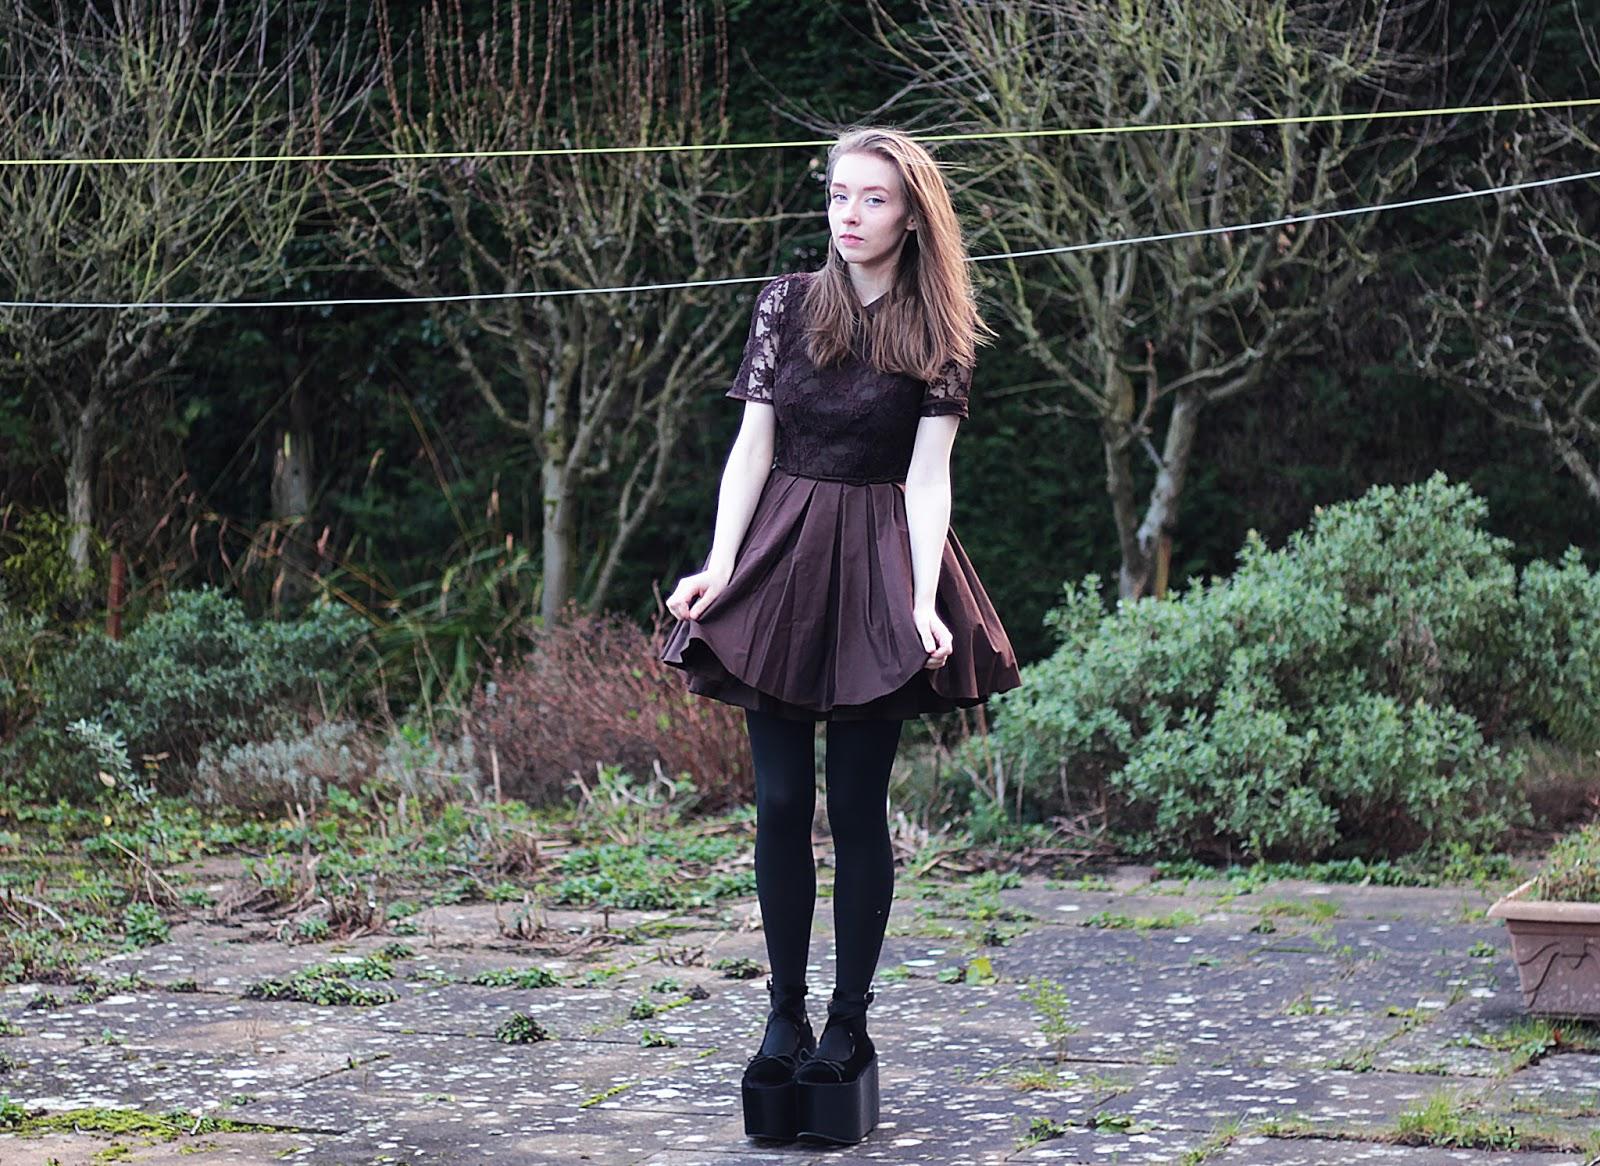 jones and jones dress cute party dress outfit inspiration